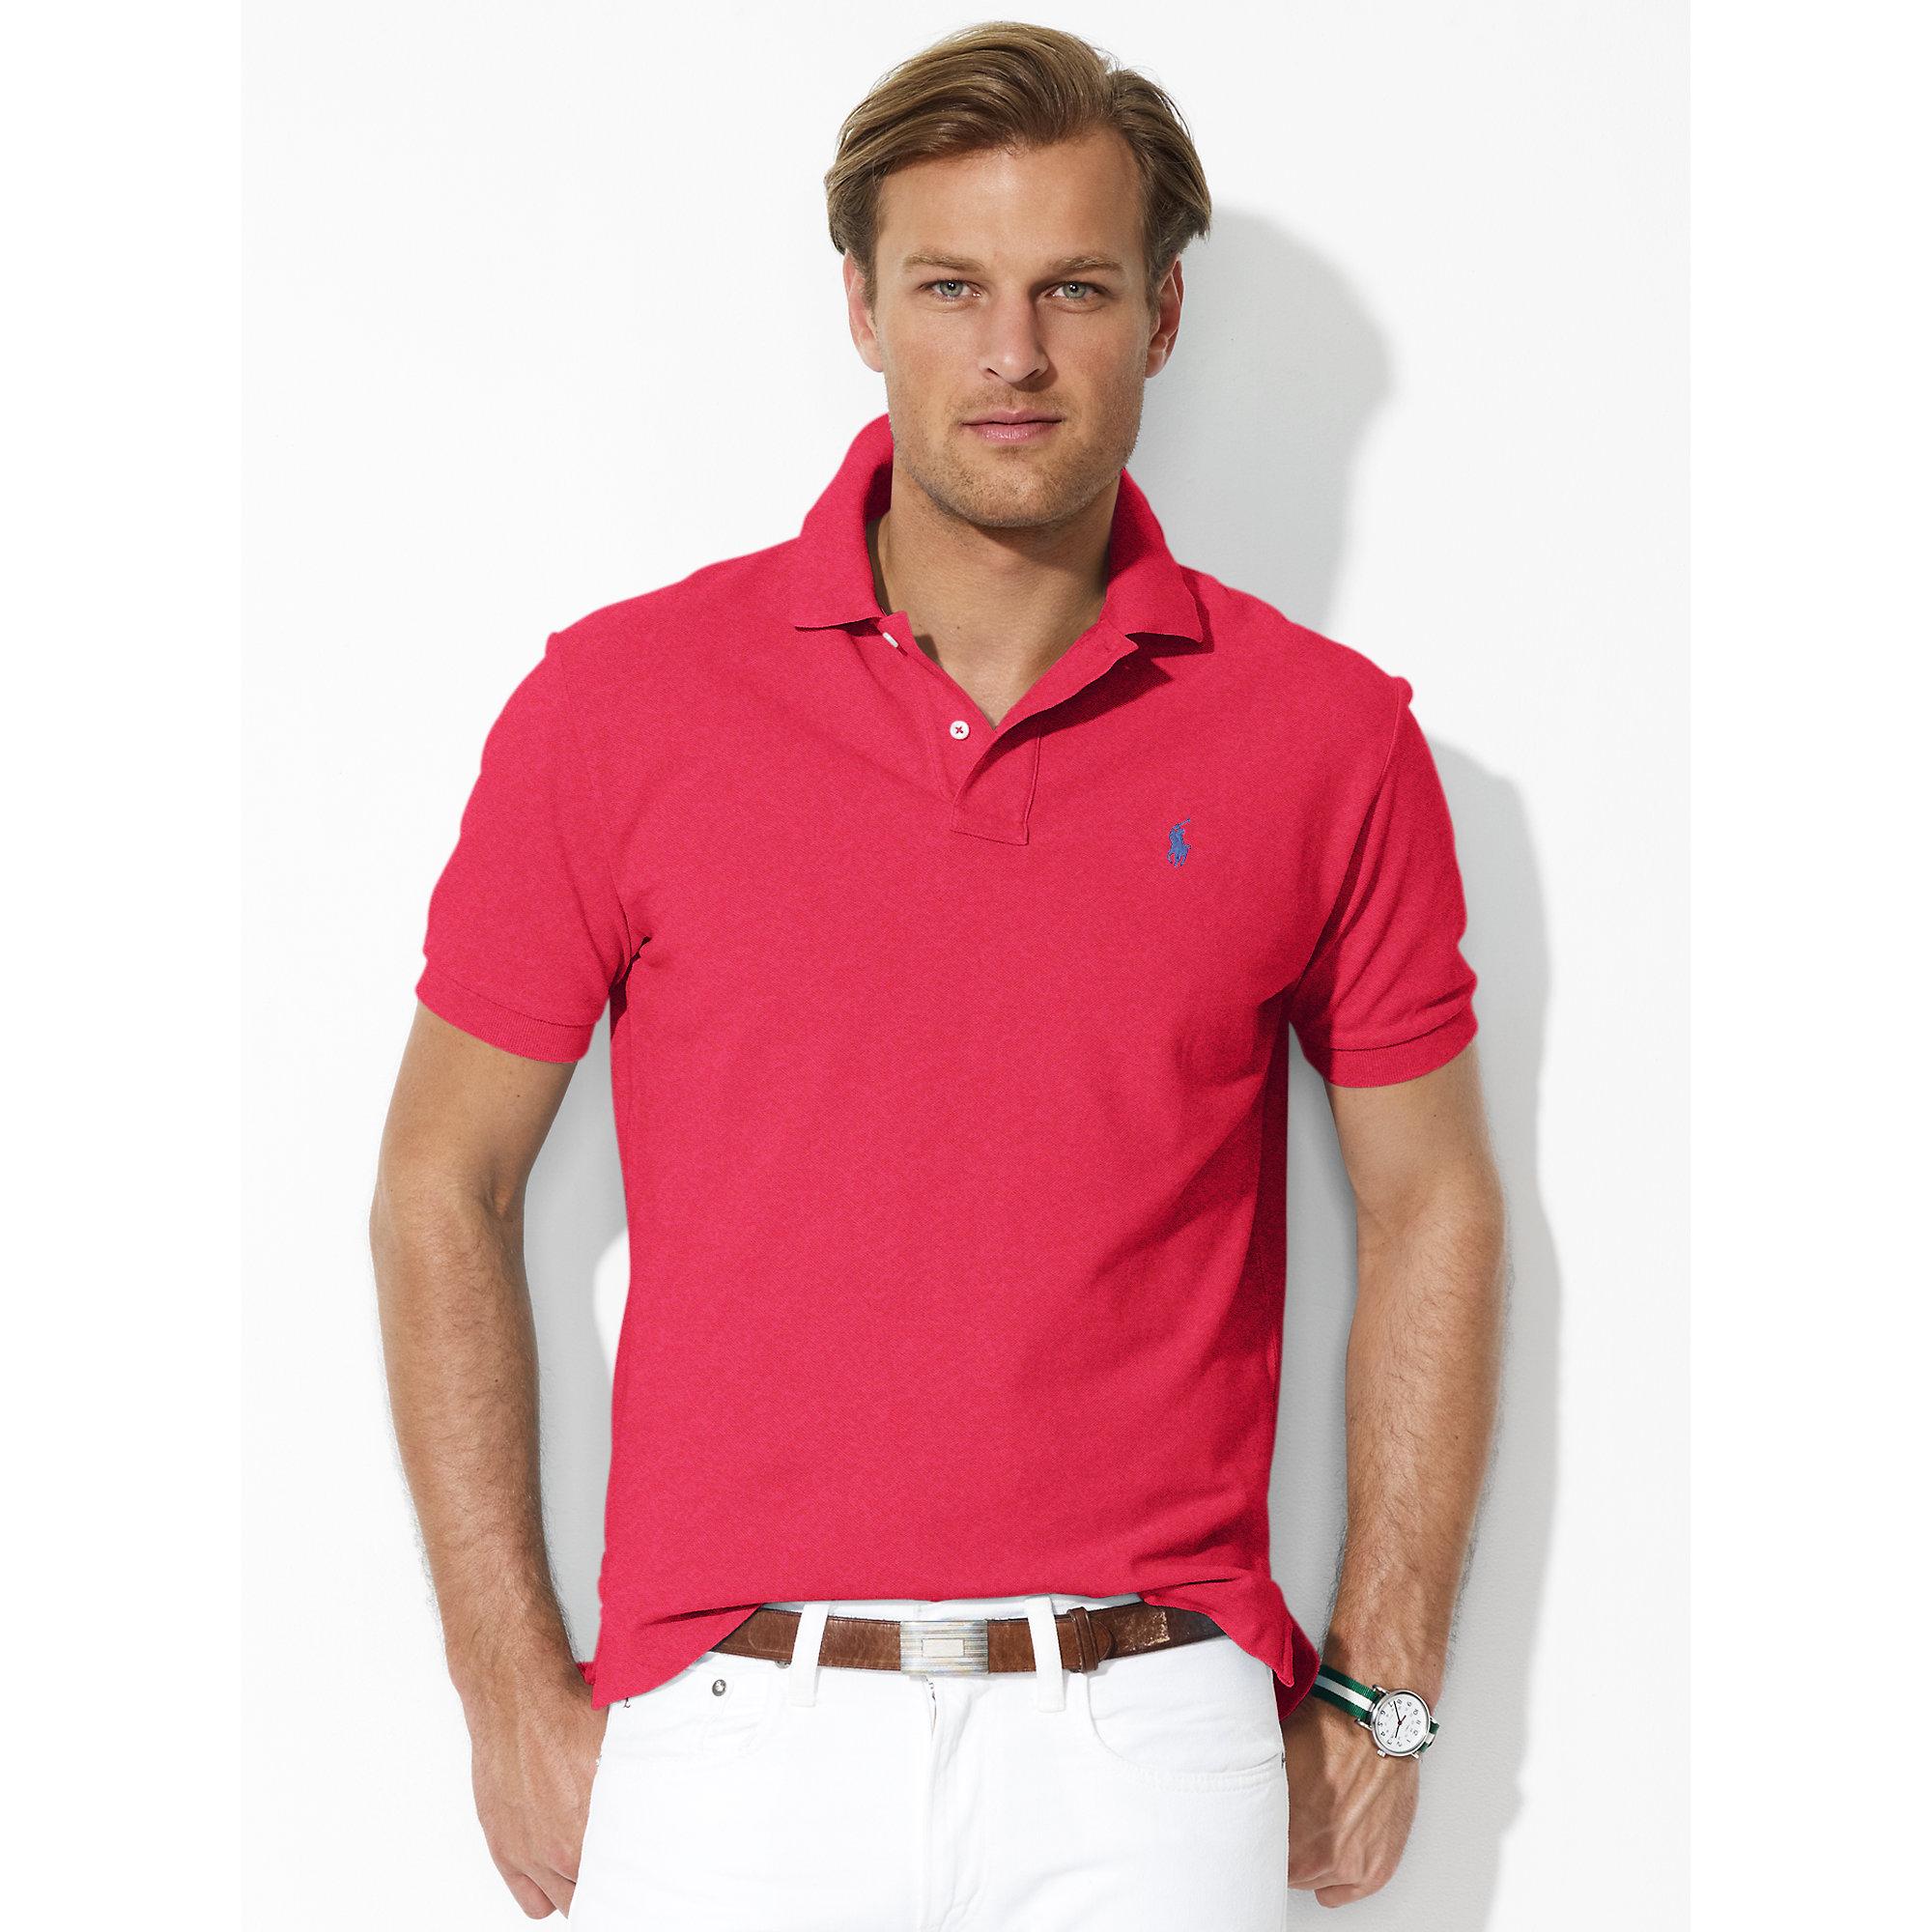 e11926e6b74a ... reduced lyst polo ralph lauren classic fit mesh polo in red for men  7da4a 785d8